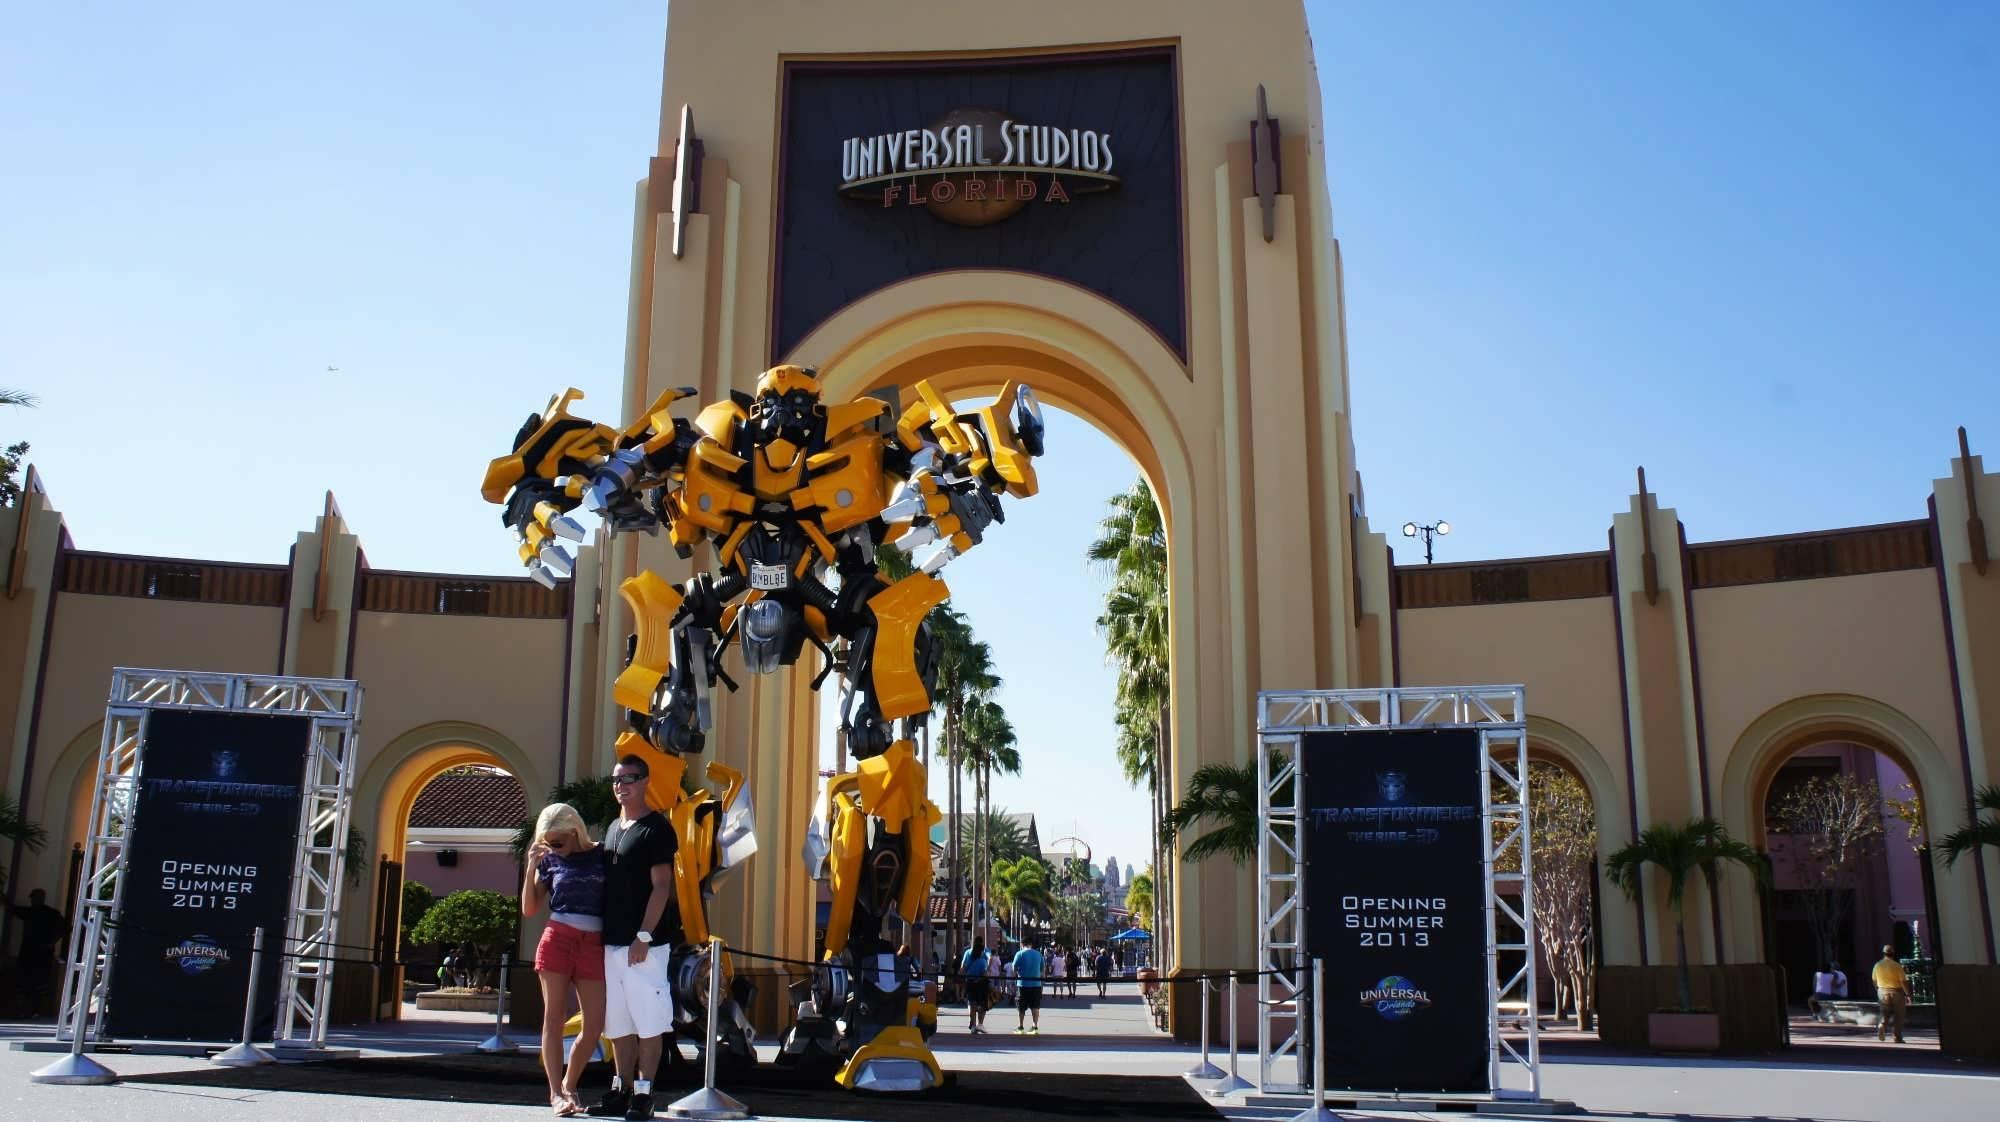 rebuilding universal studios florida a look at 2013 and beyond